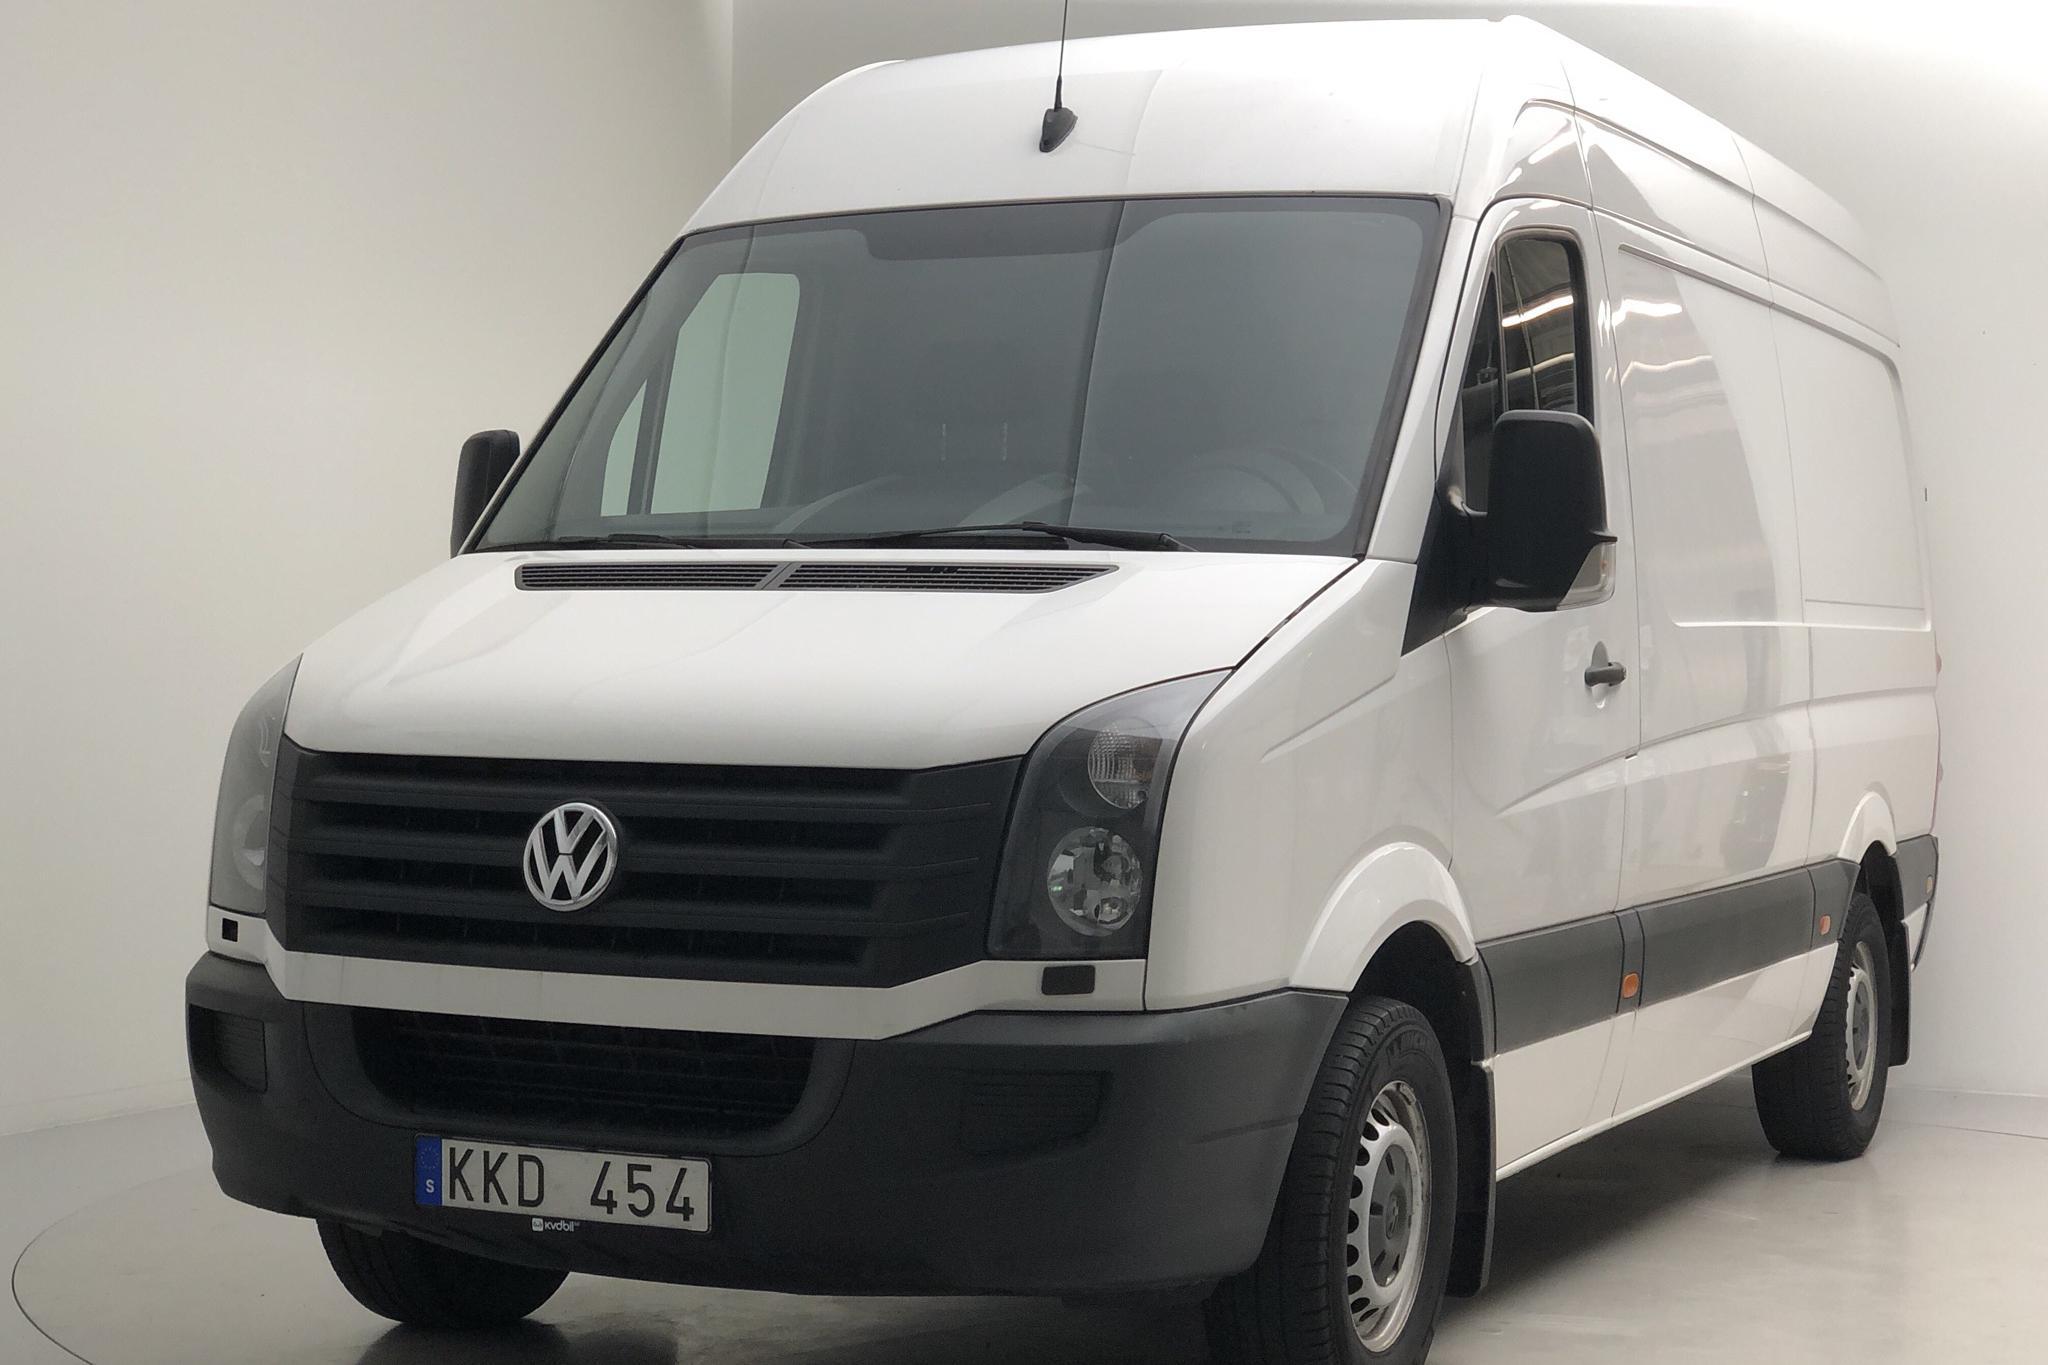 VW Crafter 35 2.0 TDI Skåp (109hk) - 194 440 km - Manual - white - 2013